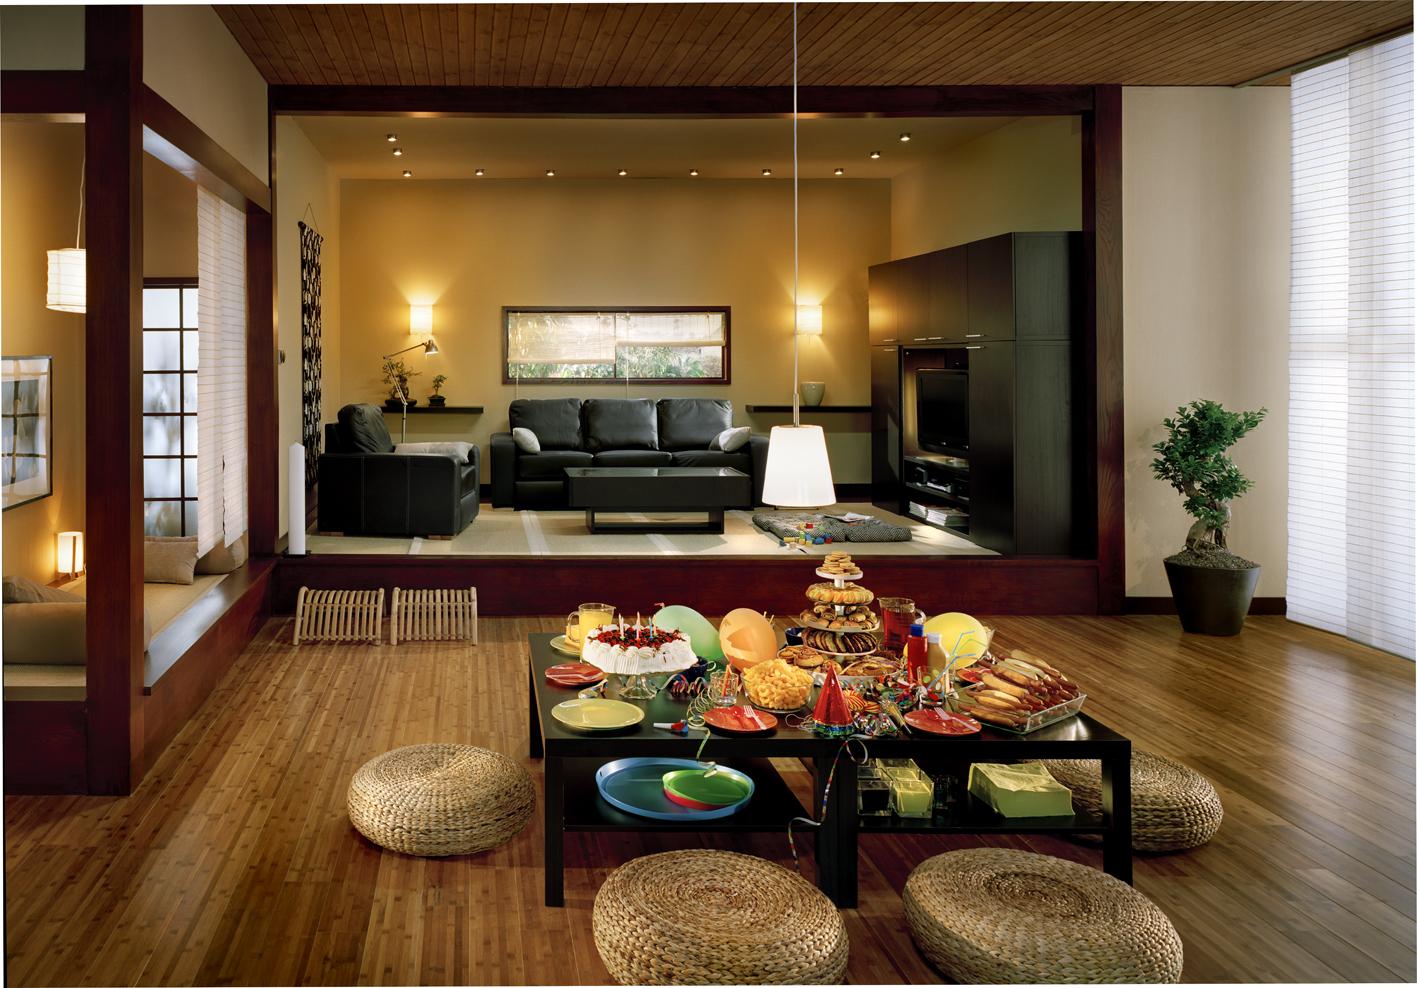 Zen decor interior japan home dining space